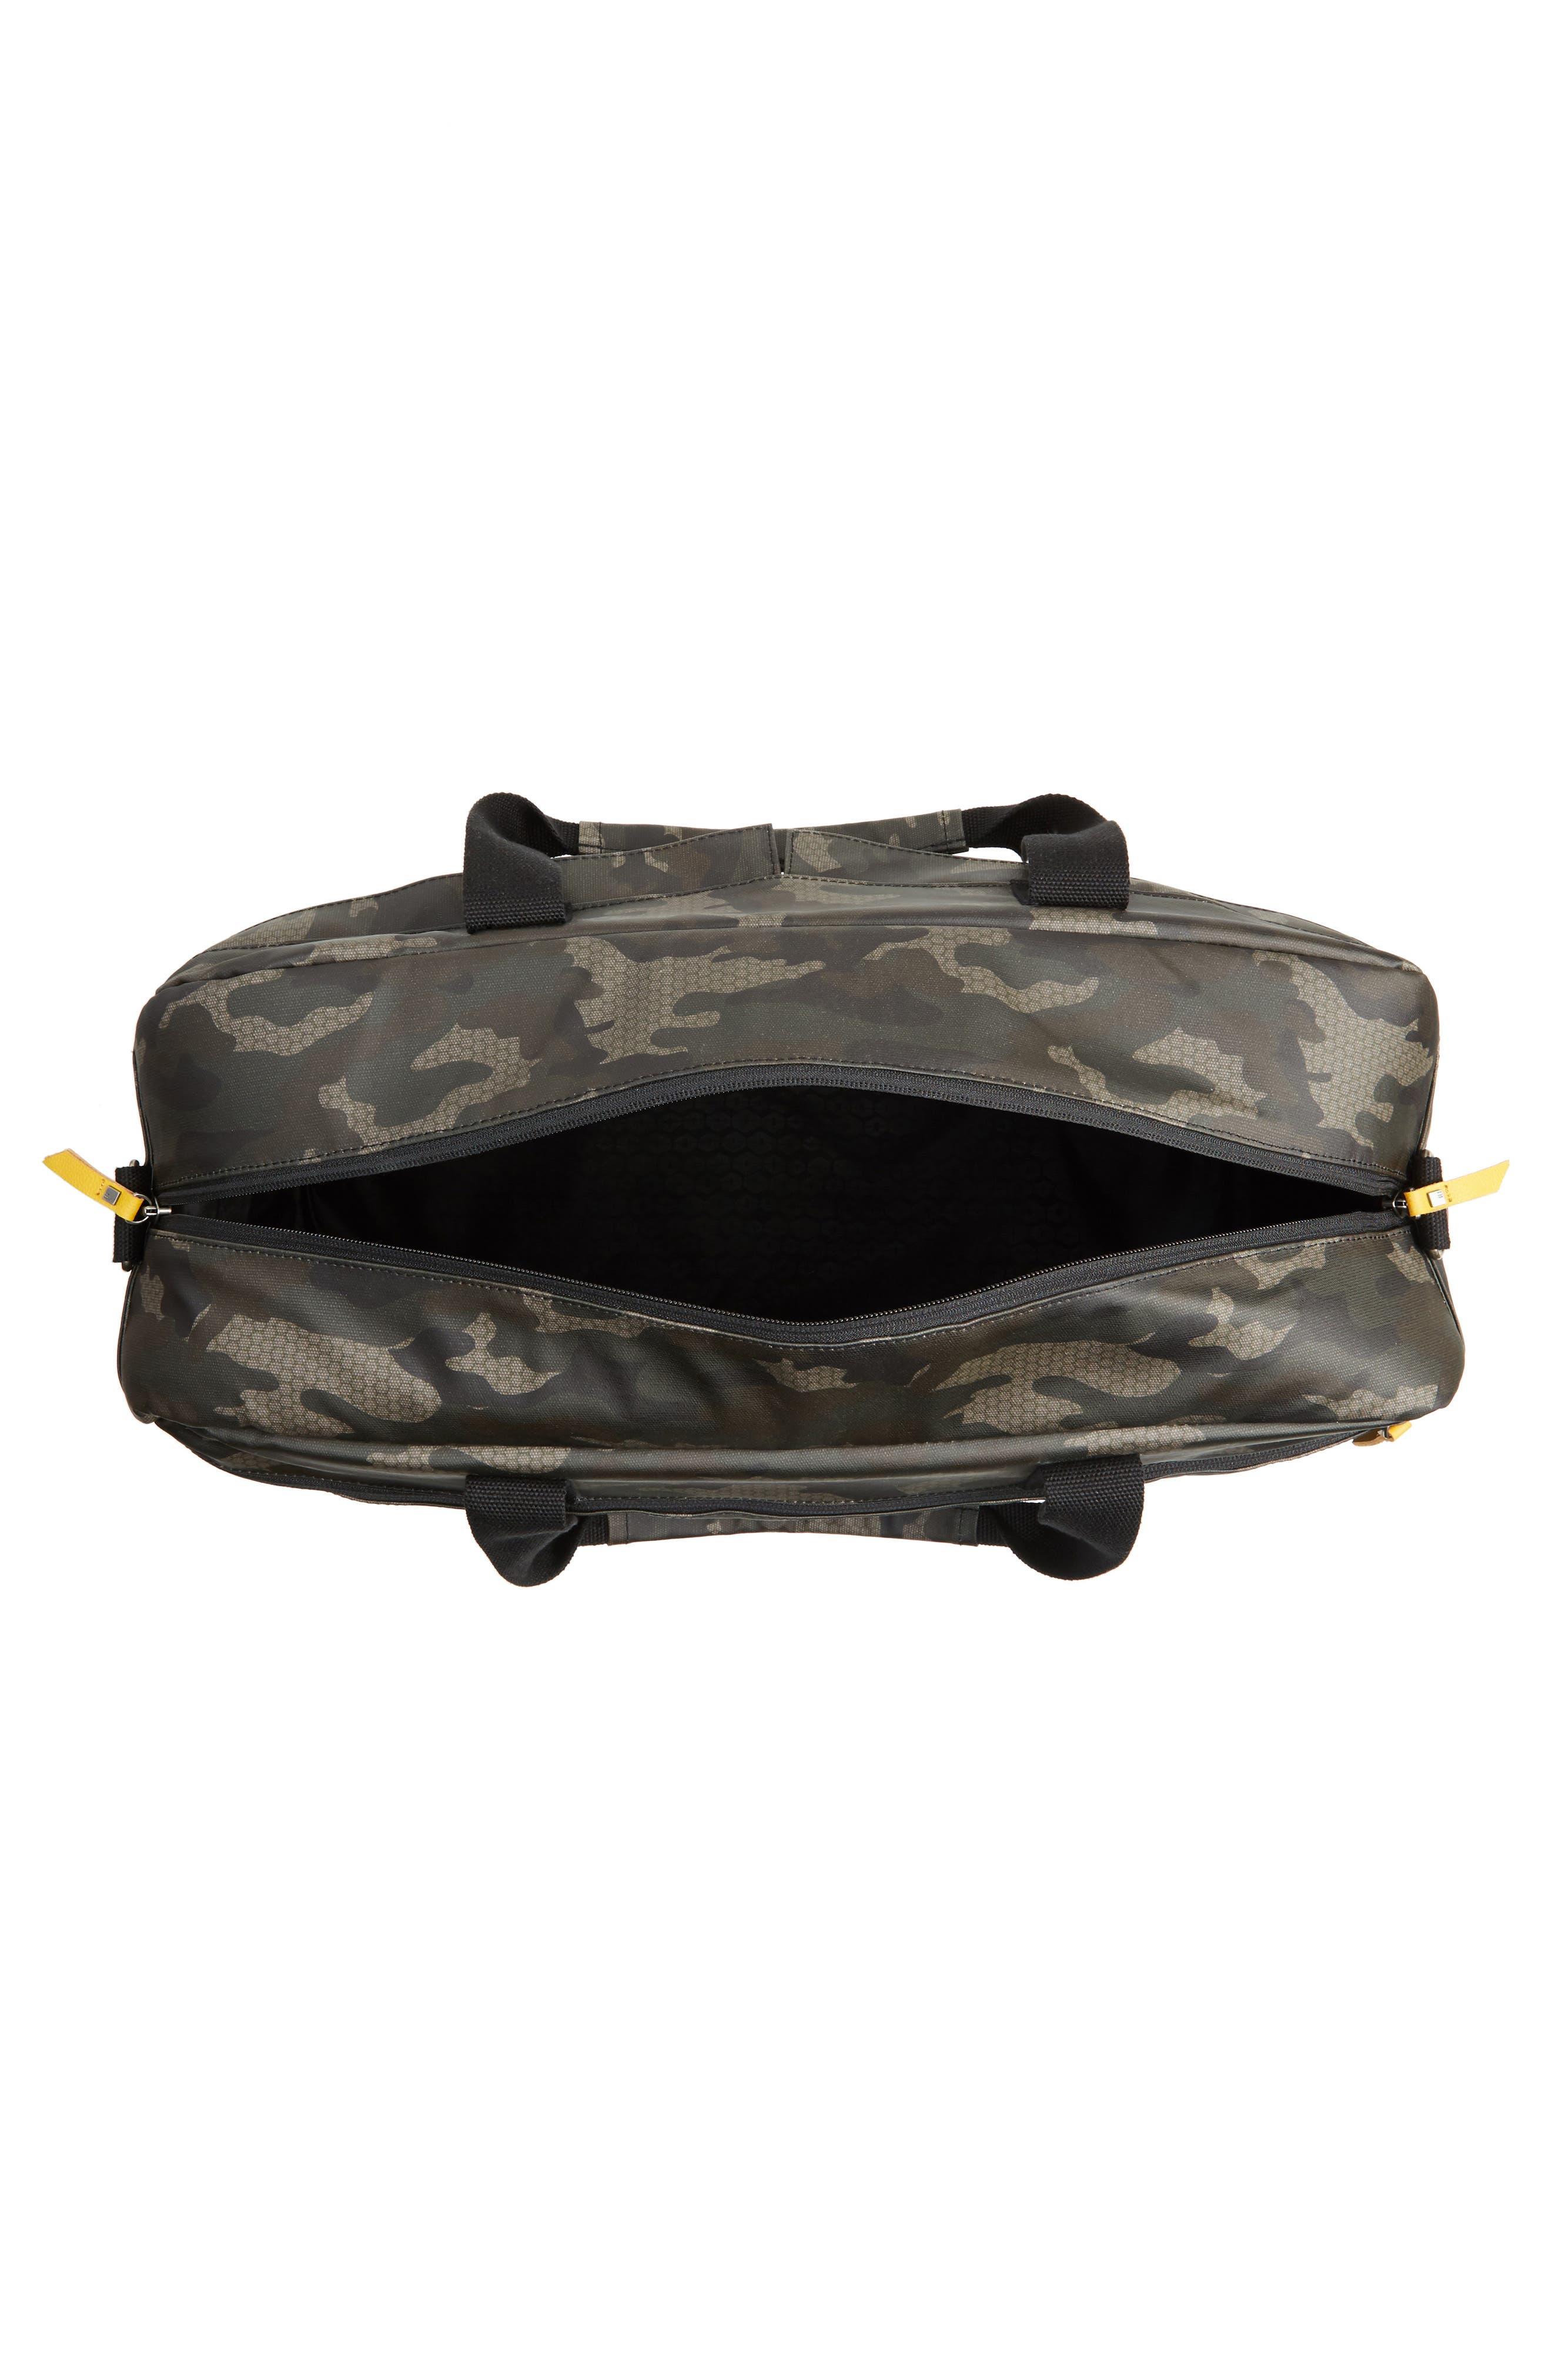 Calibre Duffel Bag,                             Alternate thumbnail 4, color,                             Camo